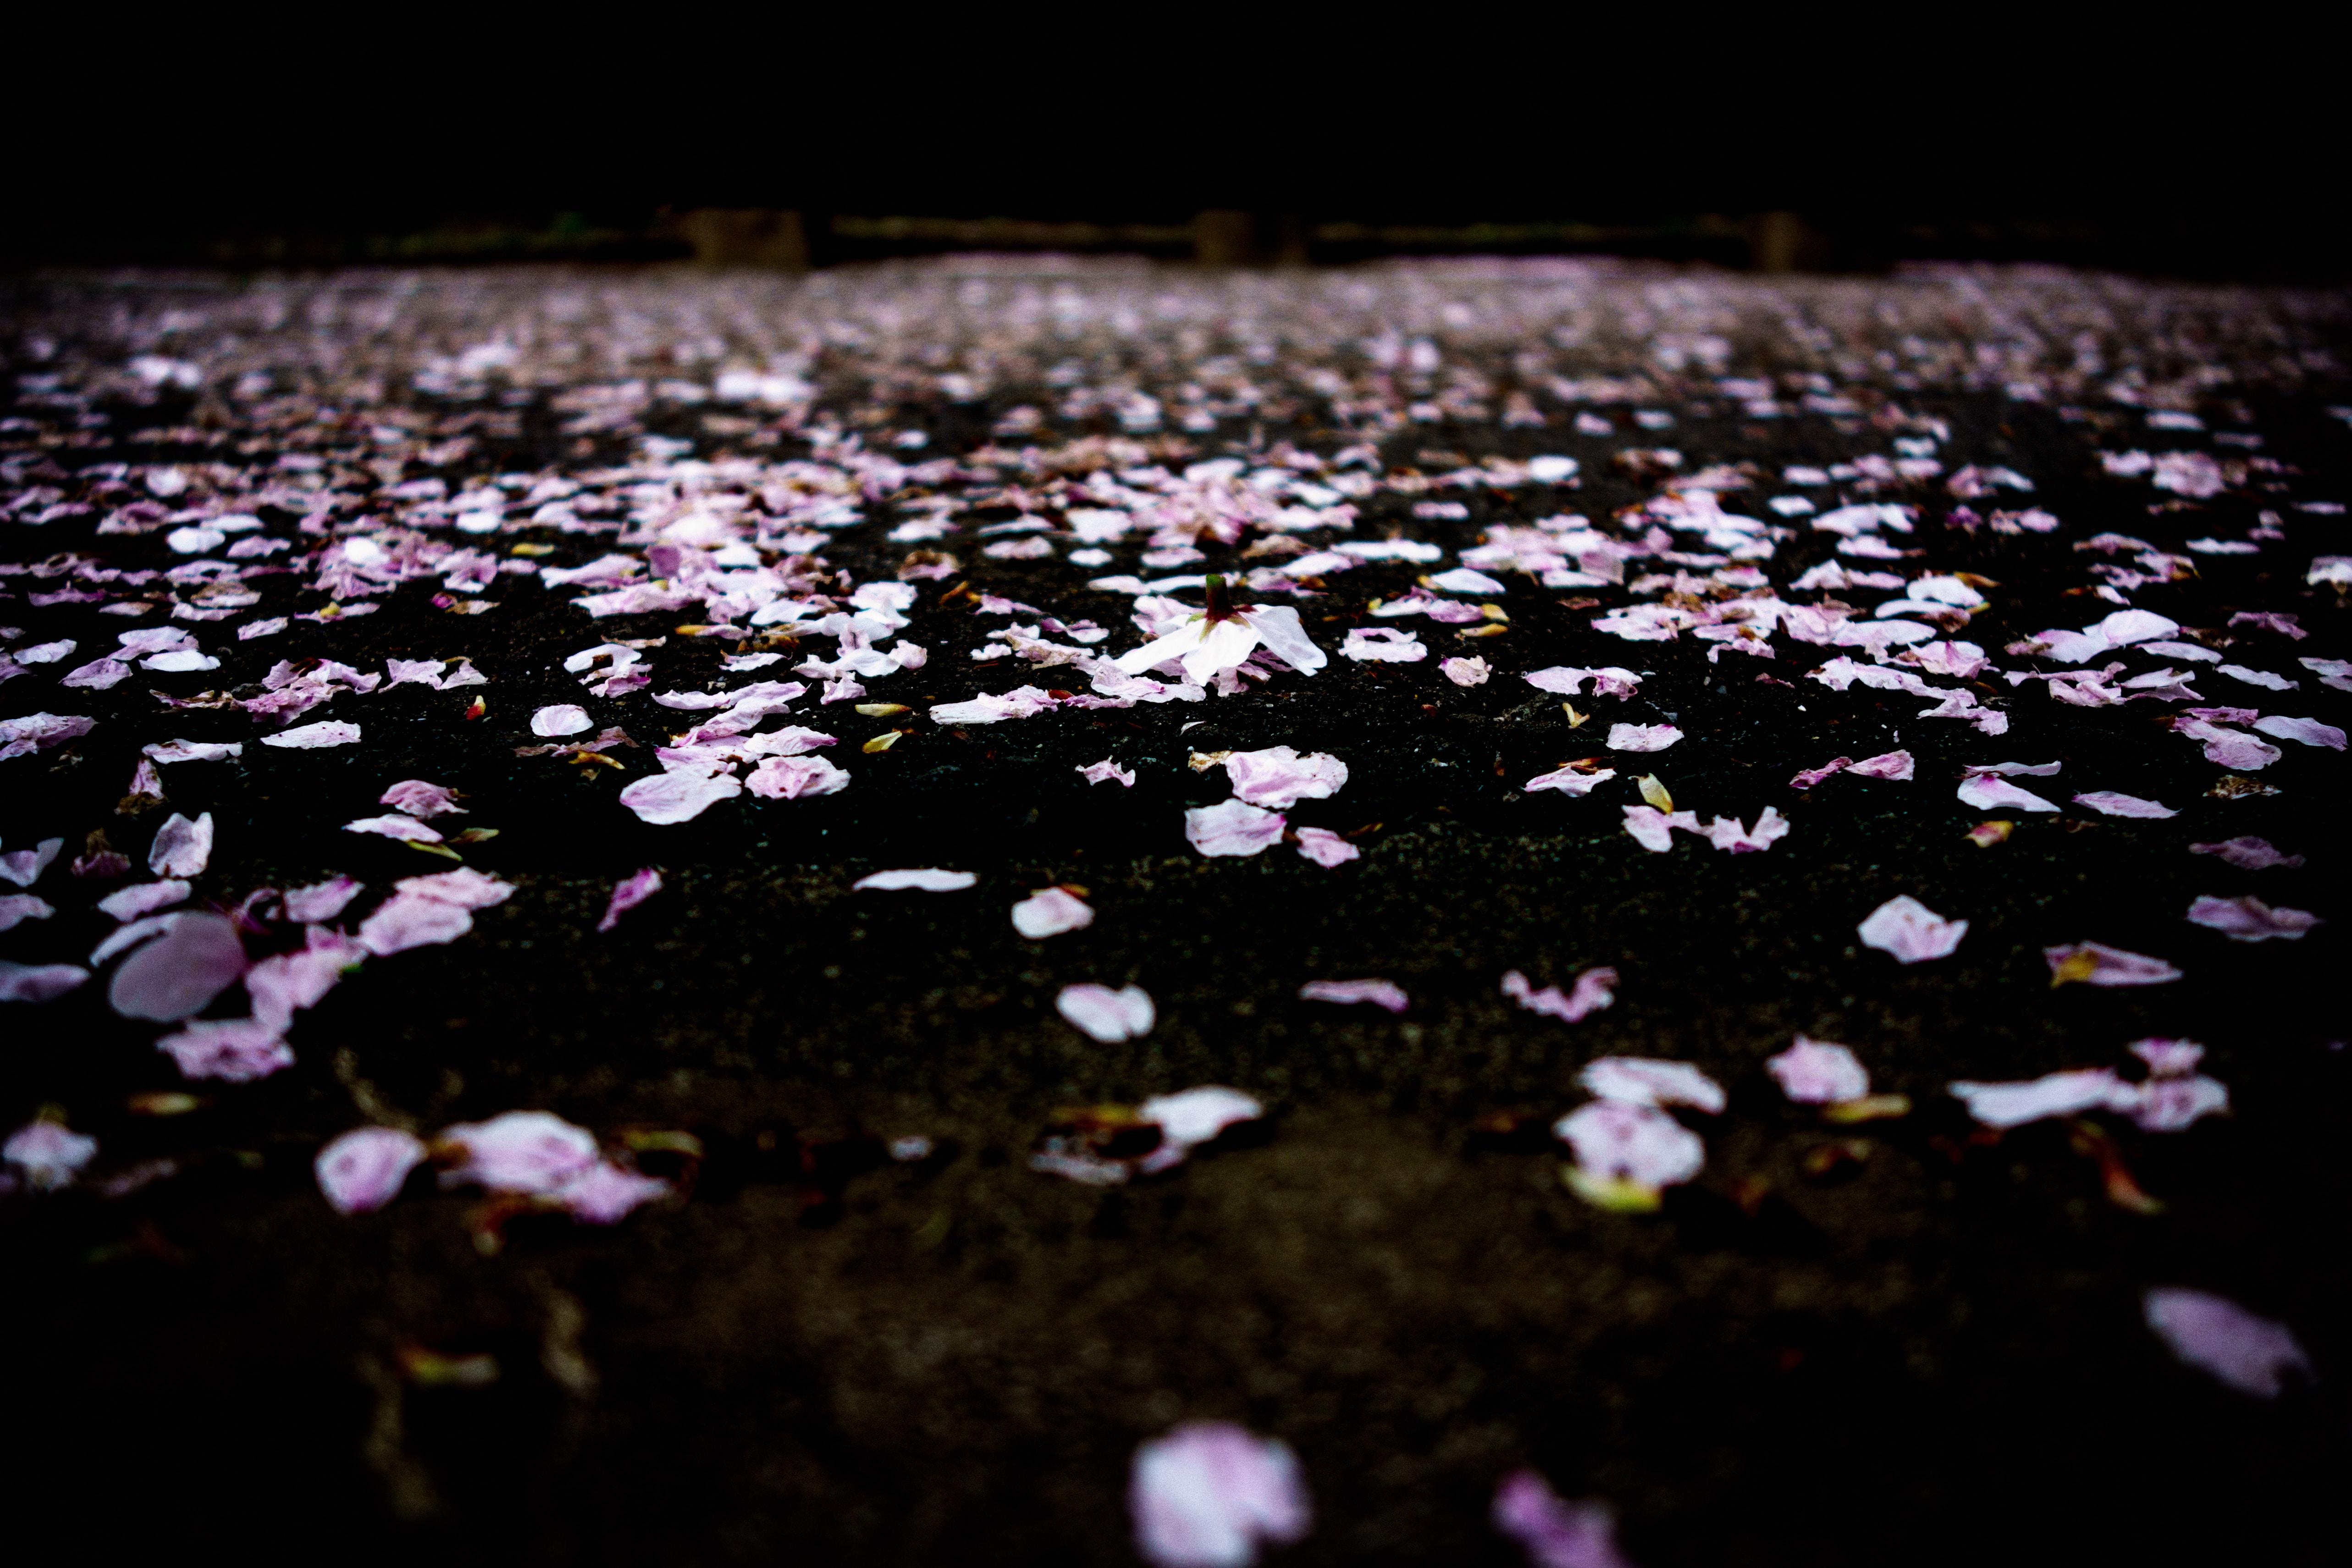 purple petals floating on water